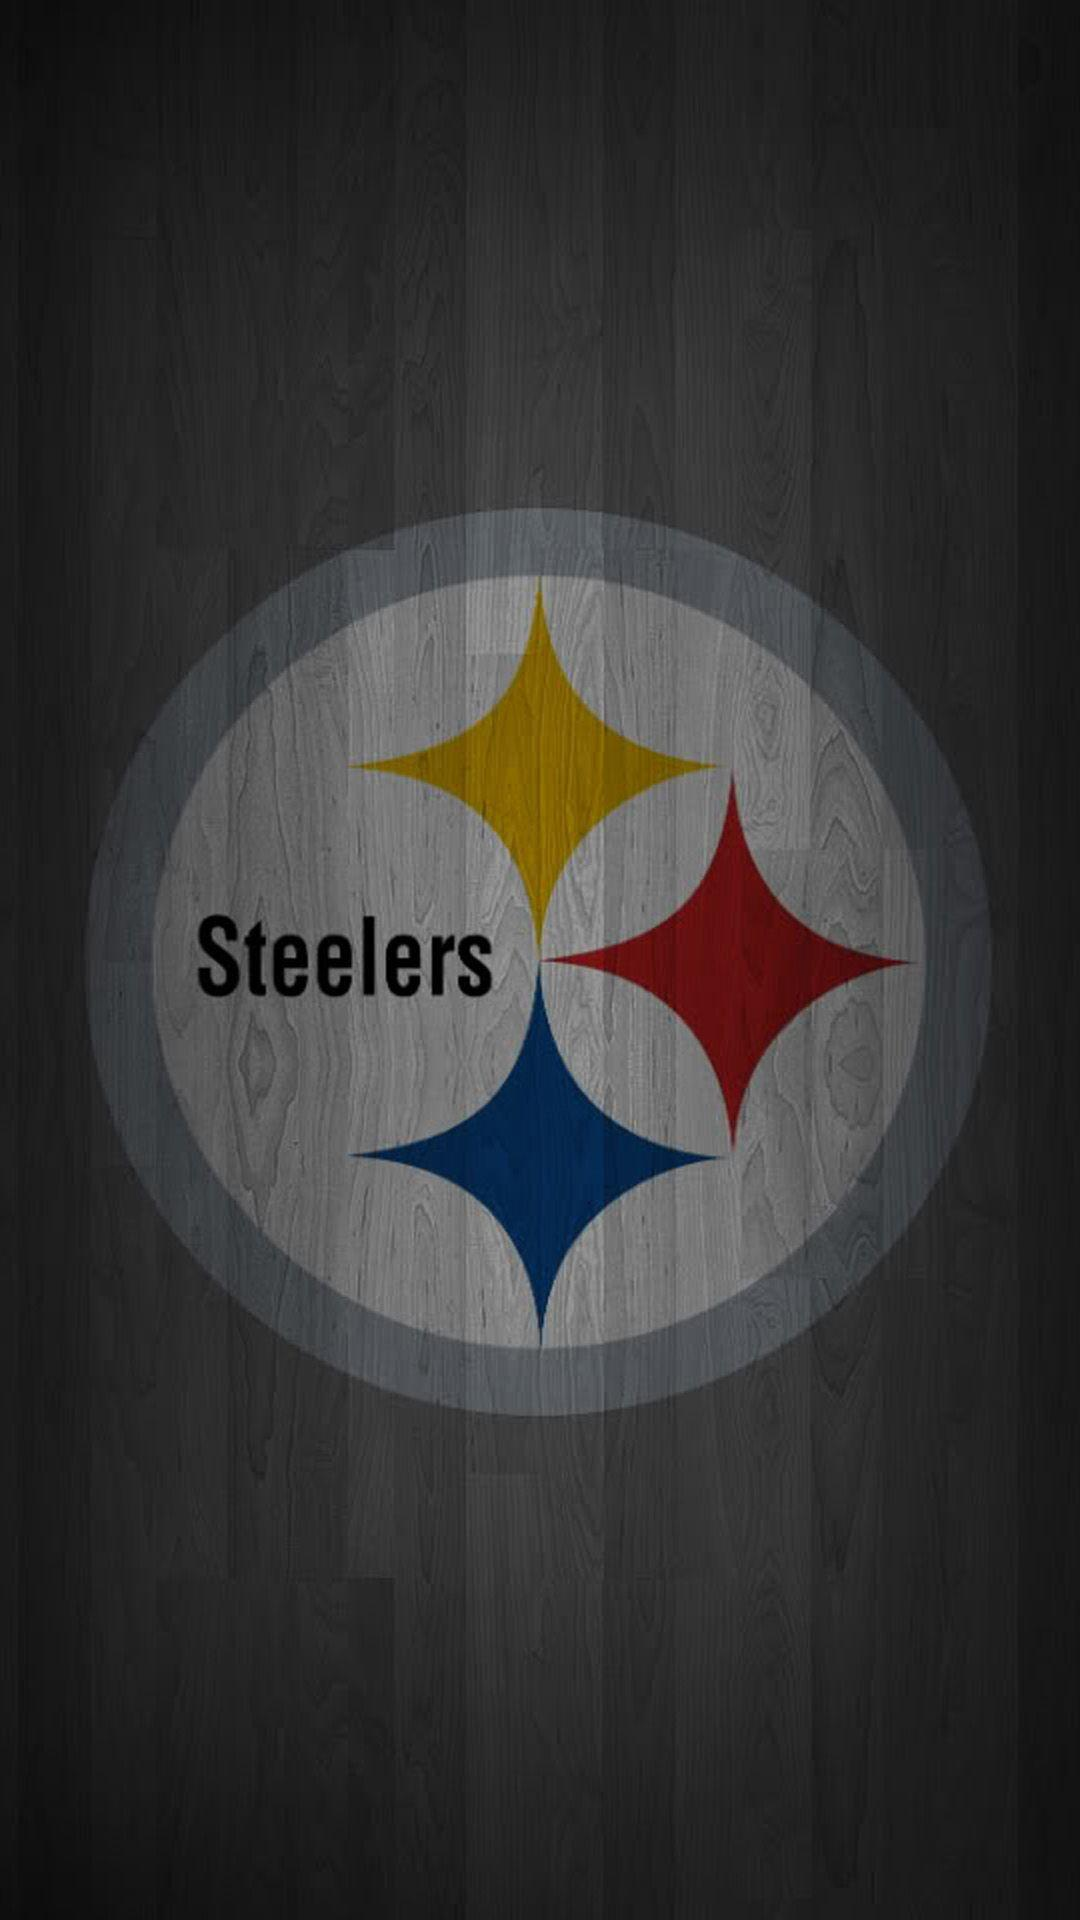 Steelers Wallpapers 2016 1080x1920